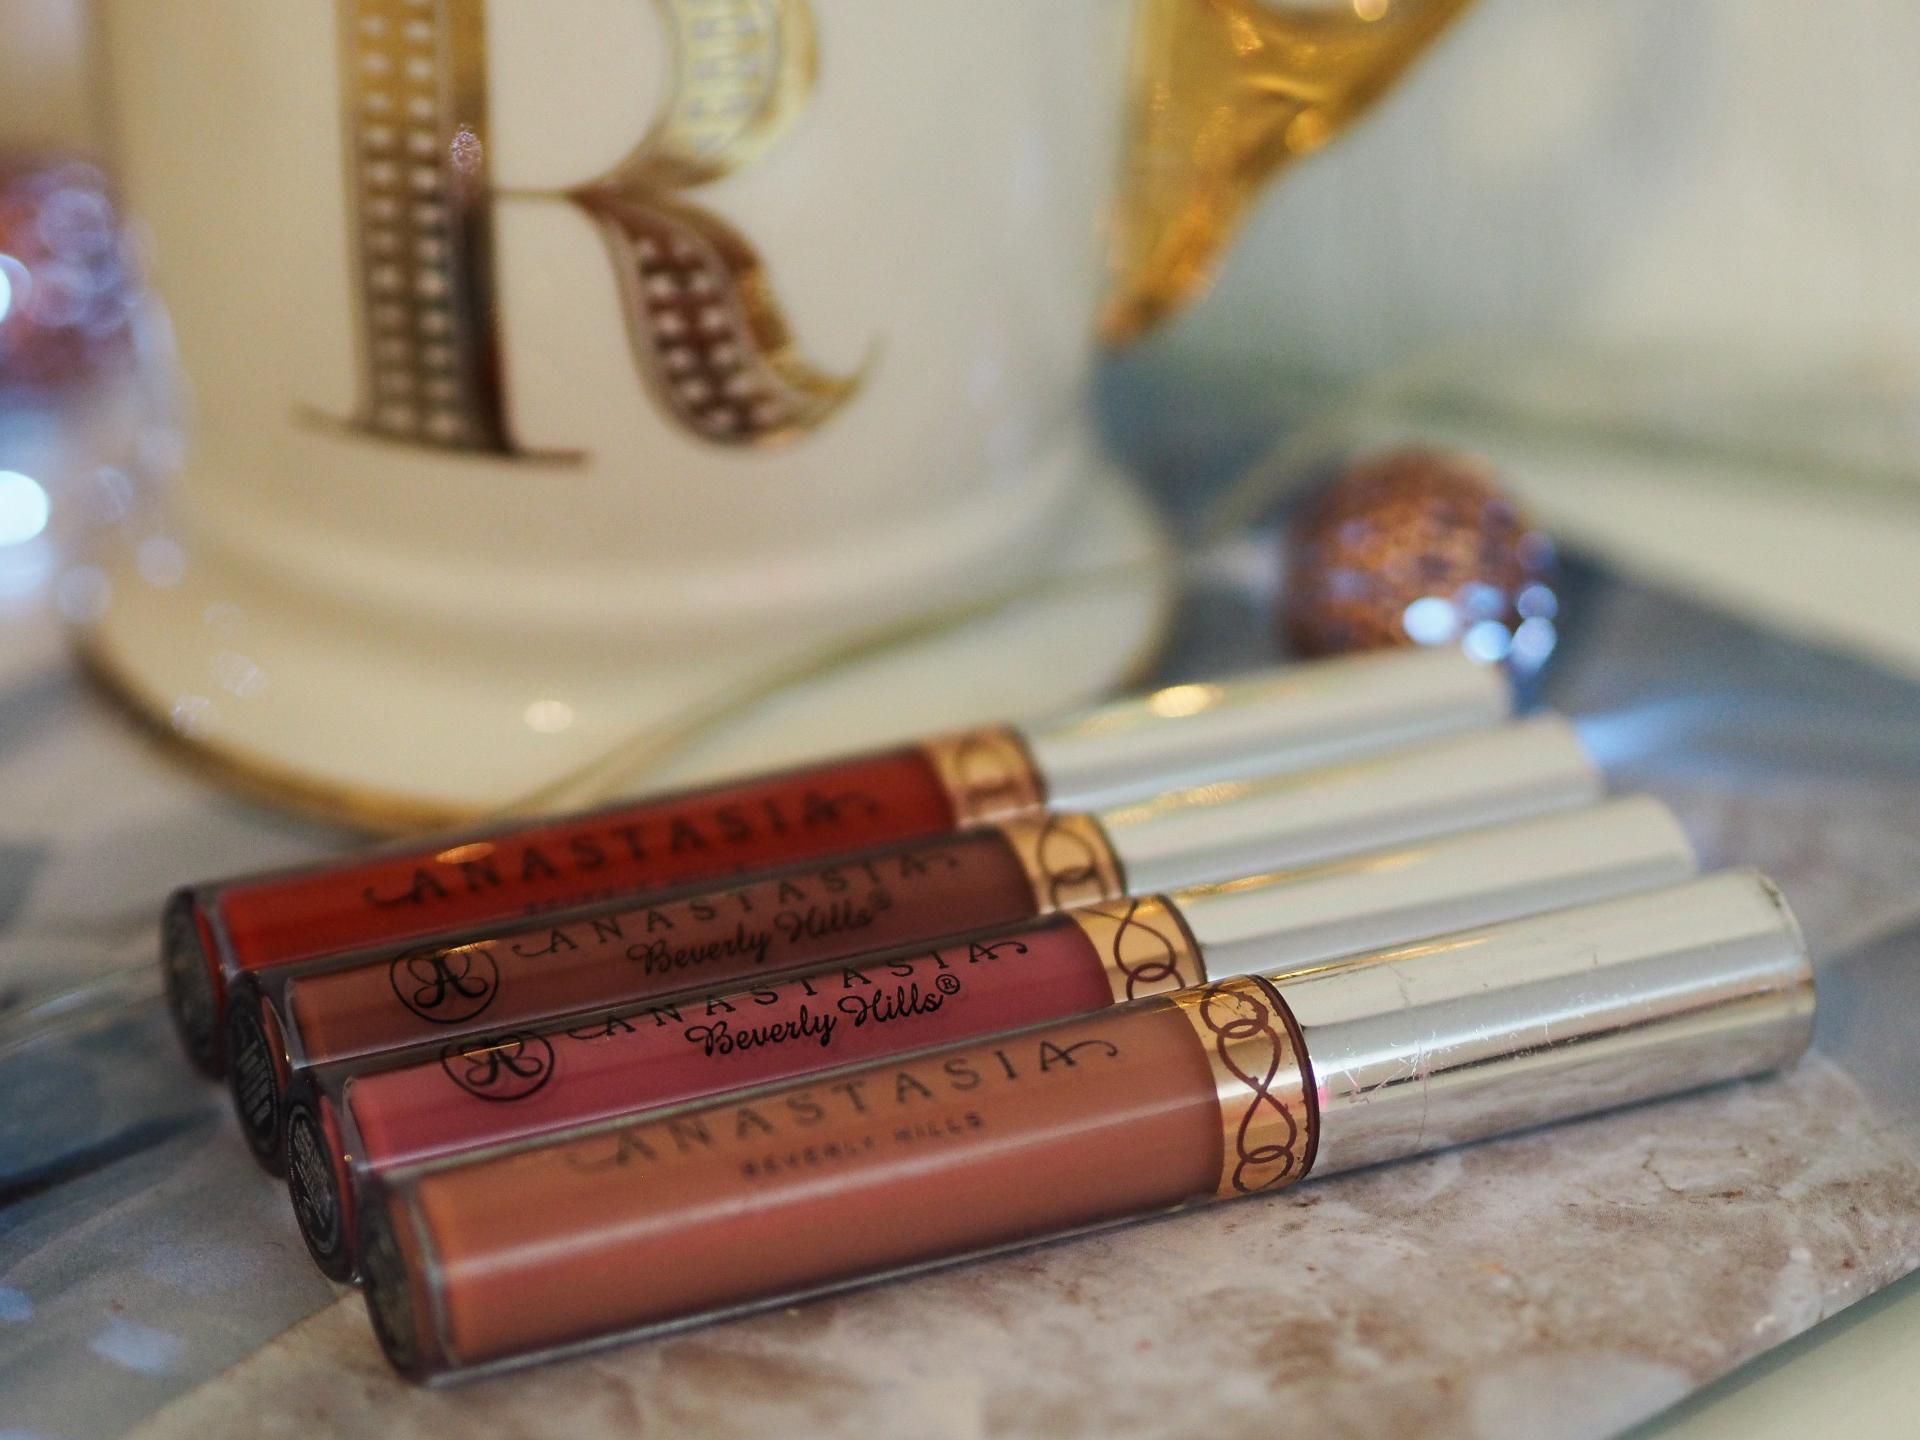 Anastasia Beverly Hills Matte Liquid Lipstick, My Current Beauty Favourites - Rachel Nicole UK Blogger